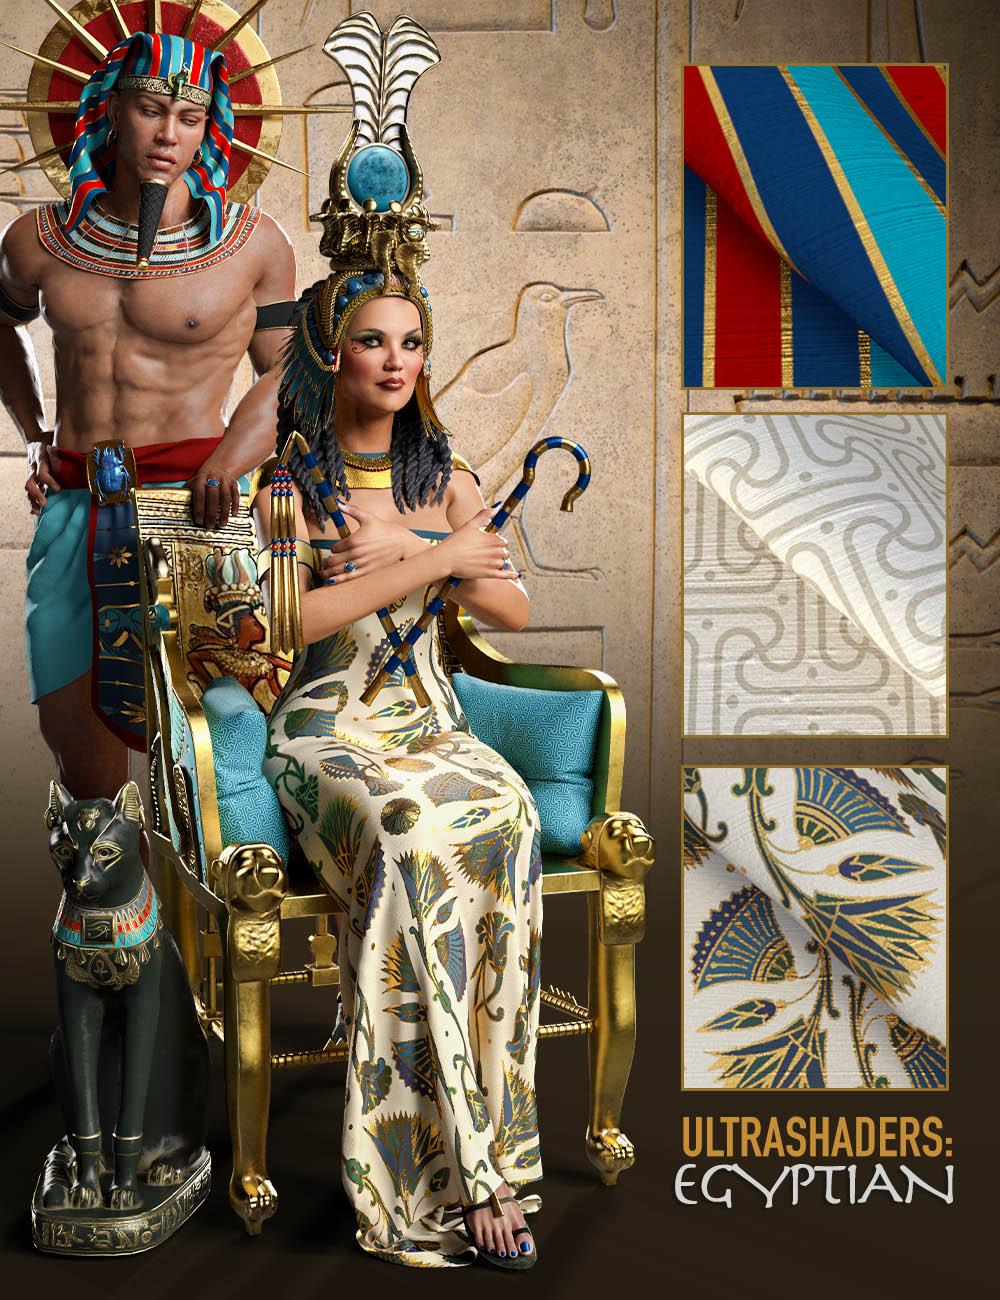 Ultra Shaders: Egyptian Fabrics by: Zai by DesignCG Boss, 3D Models by Daz 3D